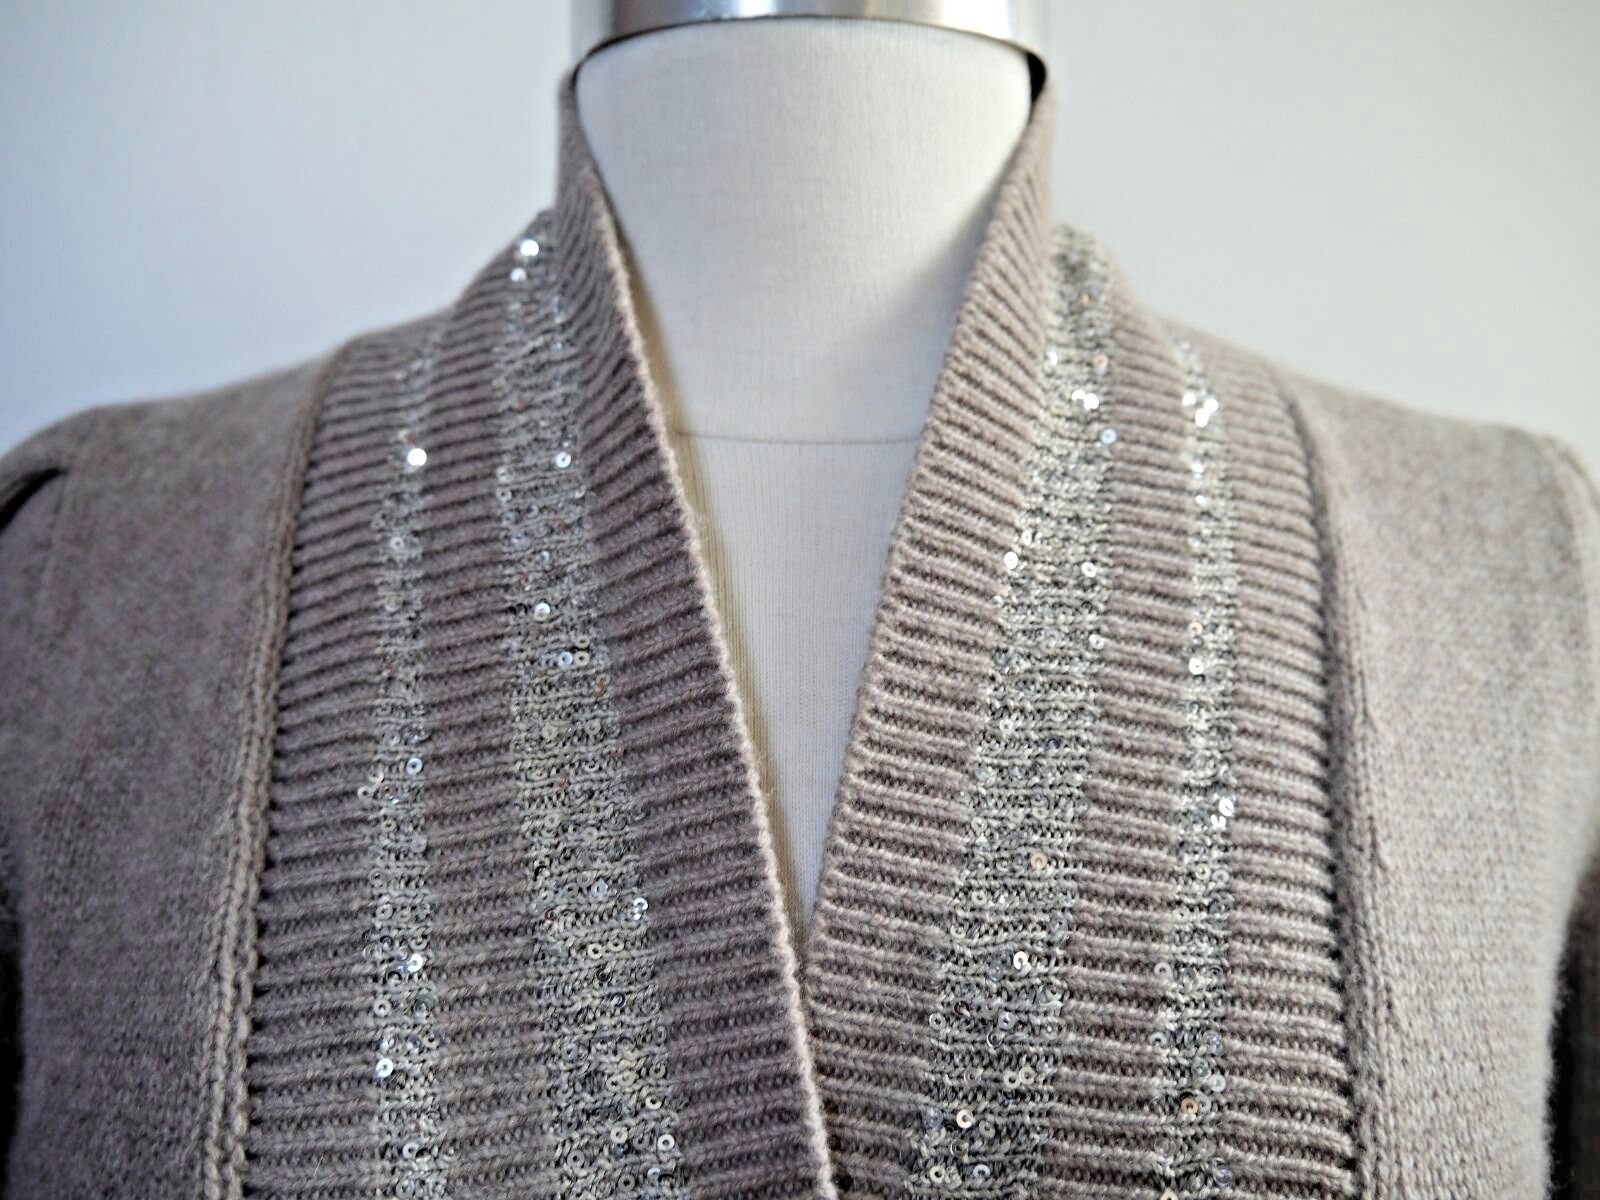 BRUNELLO CUCINELLI 100% cashmere sequin detail crop cardigan sweater sweater sweater M WORN ONCE 90c731